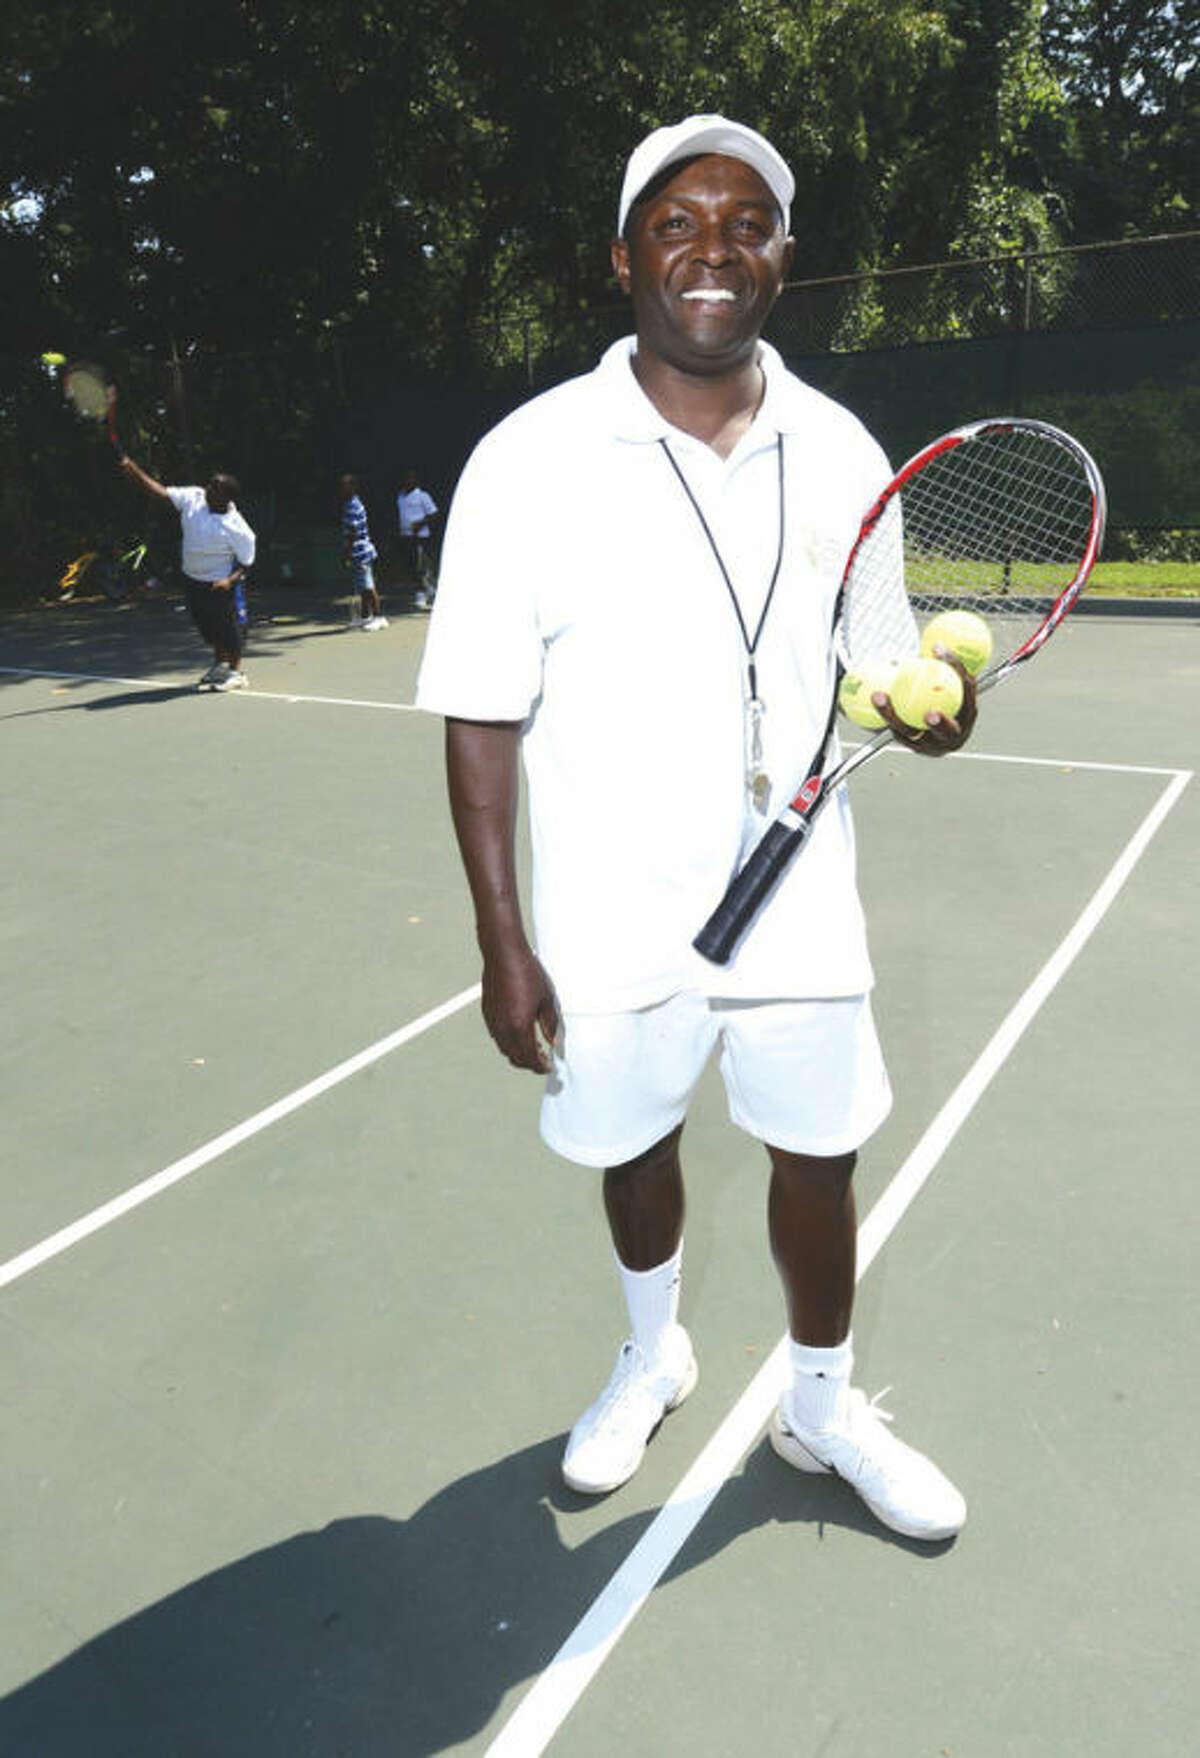 David Kimani, director of the Grass Roots Tennis program. Hour photo / Erik Trautmann